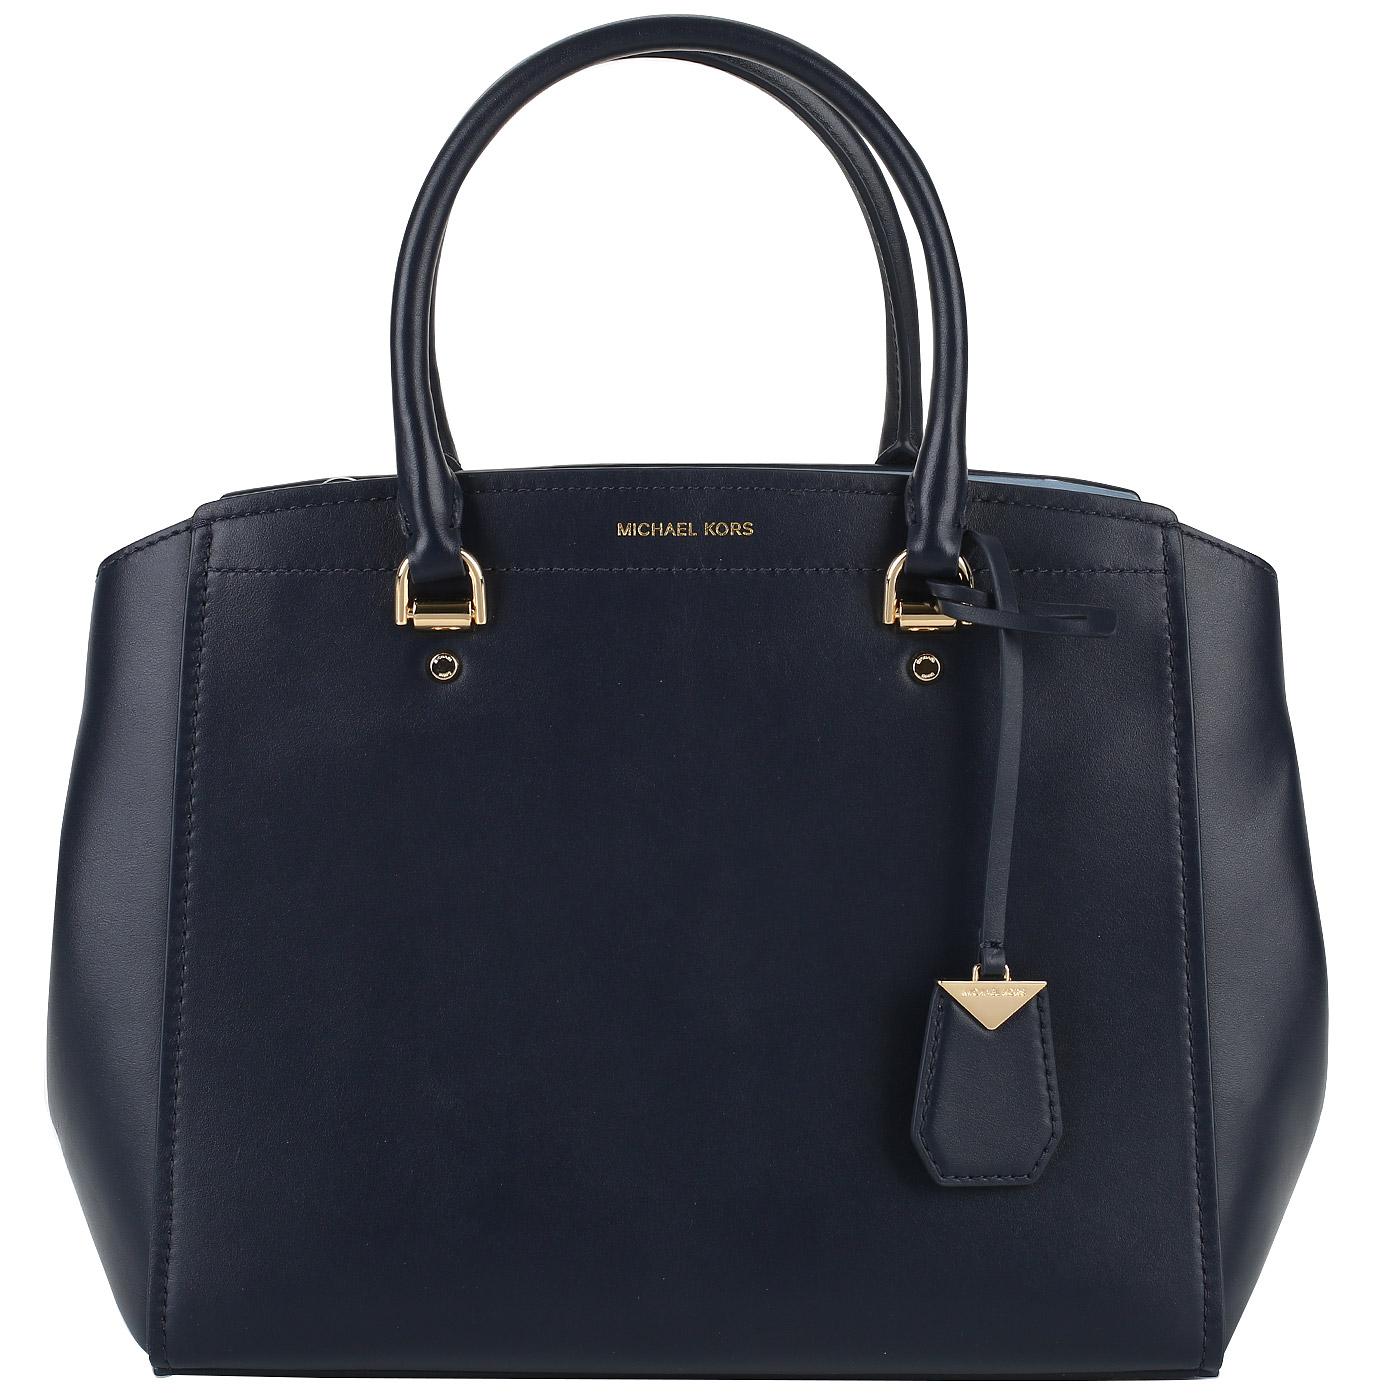 433ba4b1b984 Синяя кожаная сумка Michael Kors Benning Синяя кожаная сумка Michael Kors  Benning ...